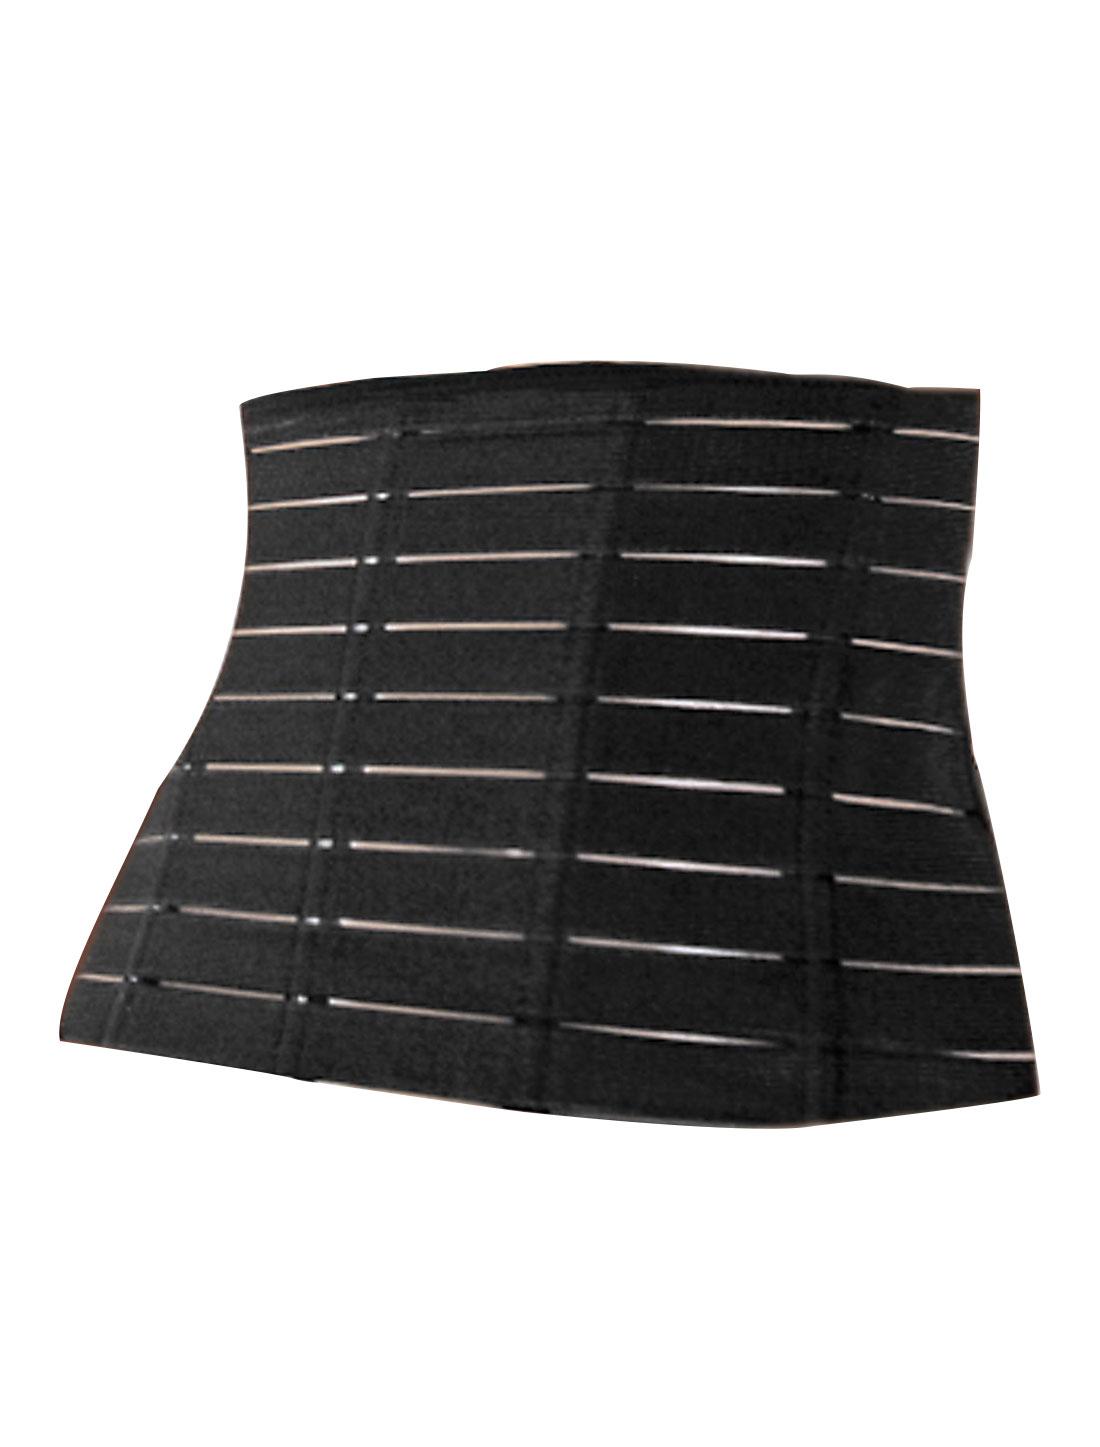 Woman Stripes Design Tummy Girdle Body Shaper Underbust Corset Waist Cincher Black S